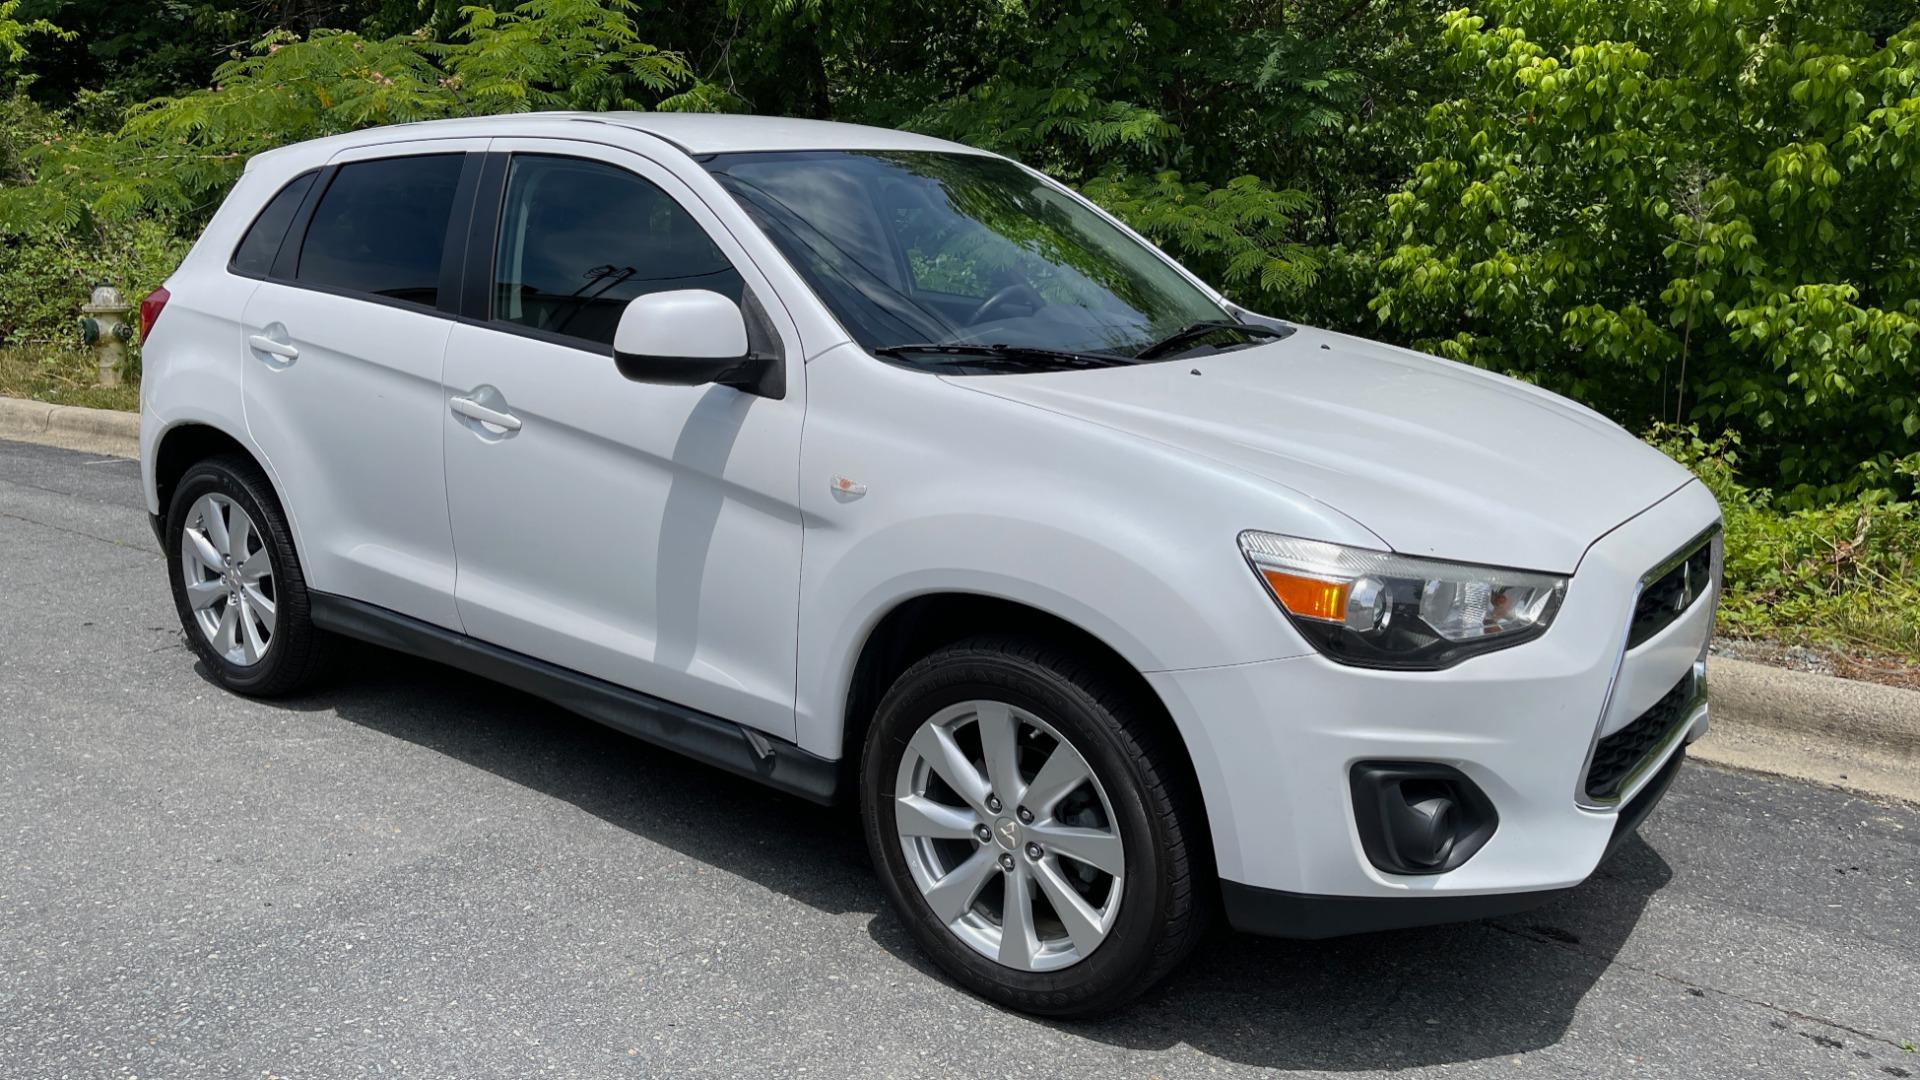 Used 2014 Mitsubishi OUTLANDER SPORT ES 2WD / 2.0L / CVT TRANS / 18IN WHEELS / 31MPG for sale $8,495 at Formula Imports in Charlotte NC 28227 5